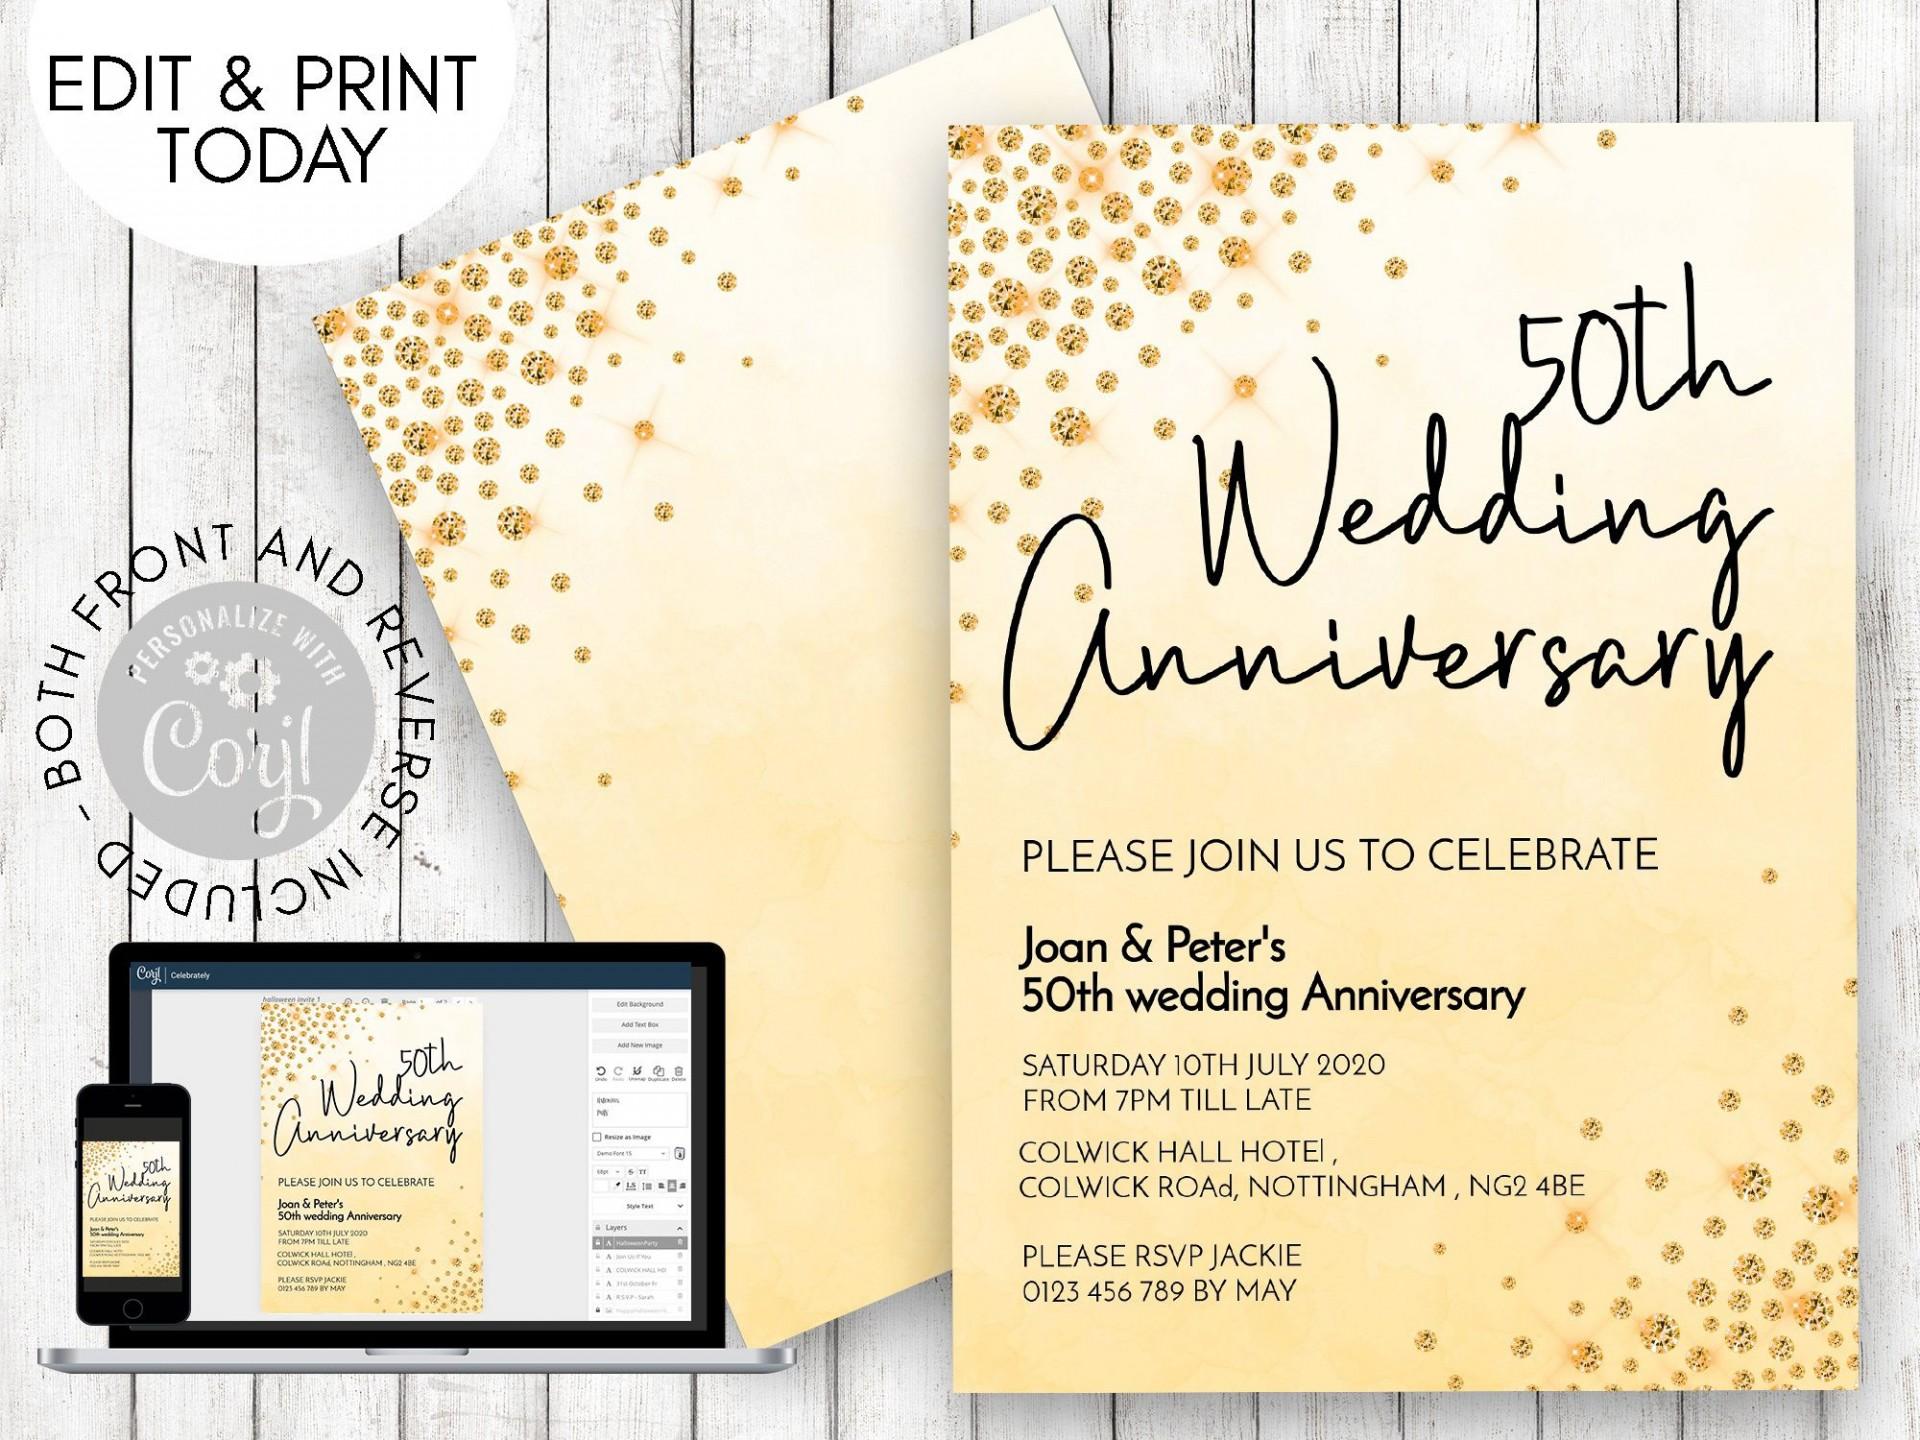 002 Sensational 50th Wedding Anniversary Invitation Template Free Download Inspiration  Golden1920